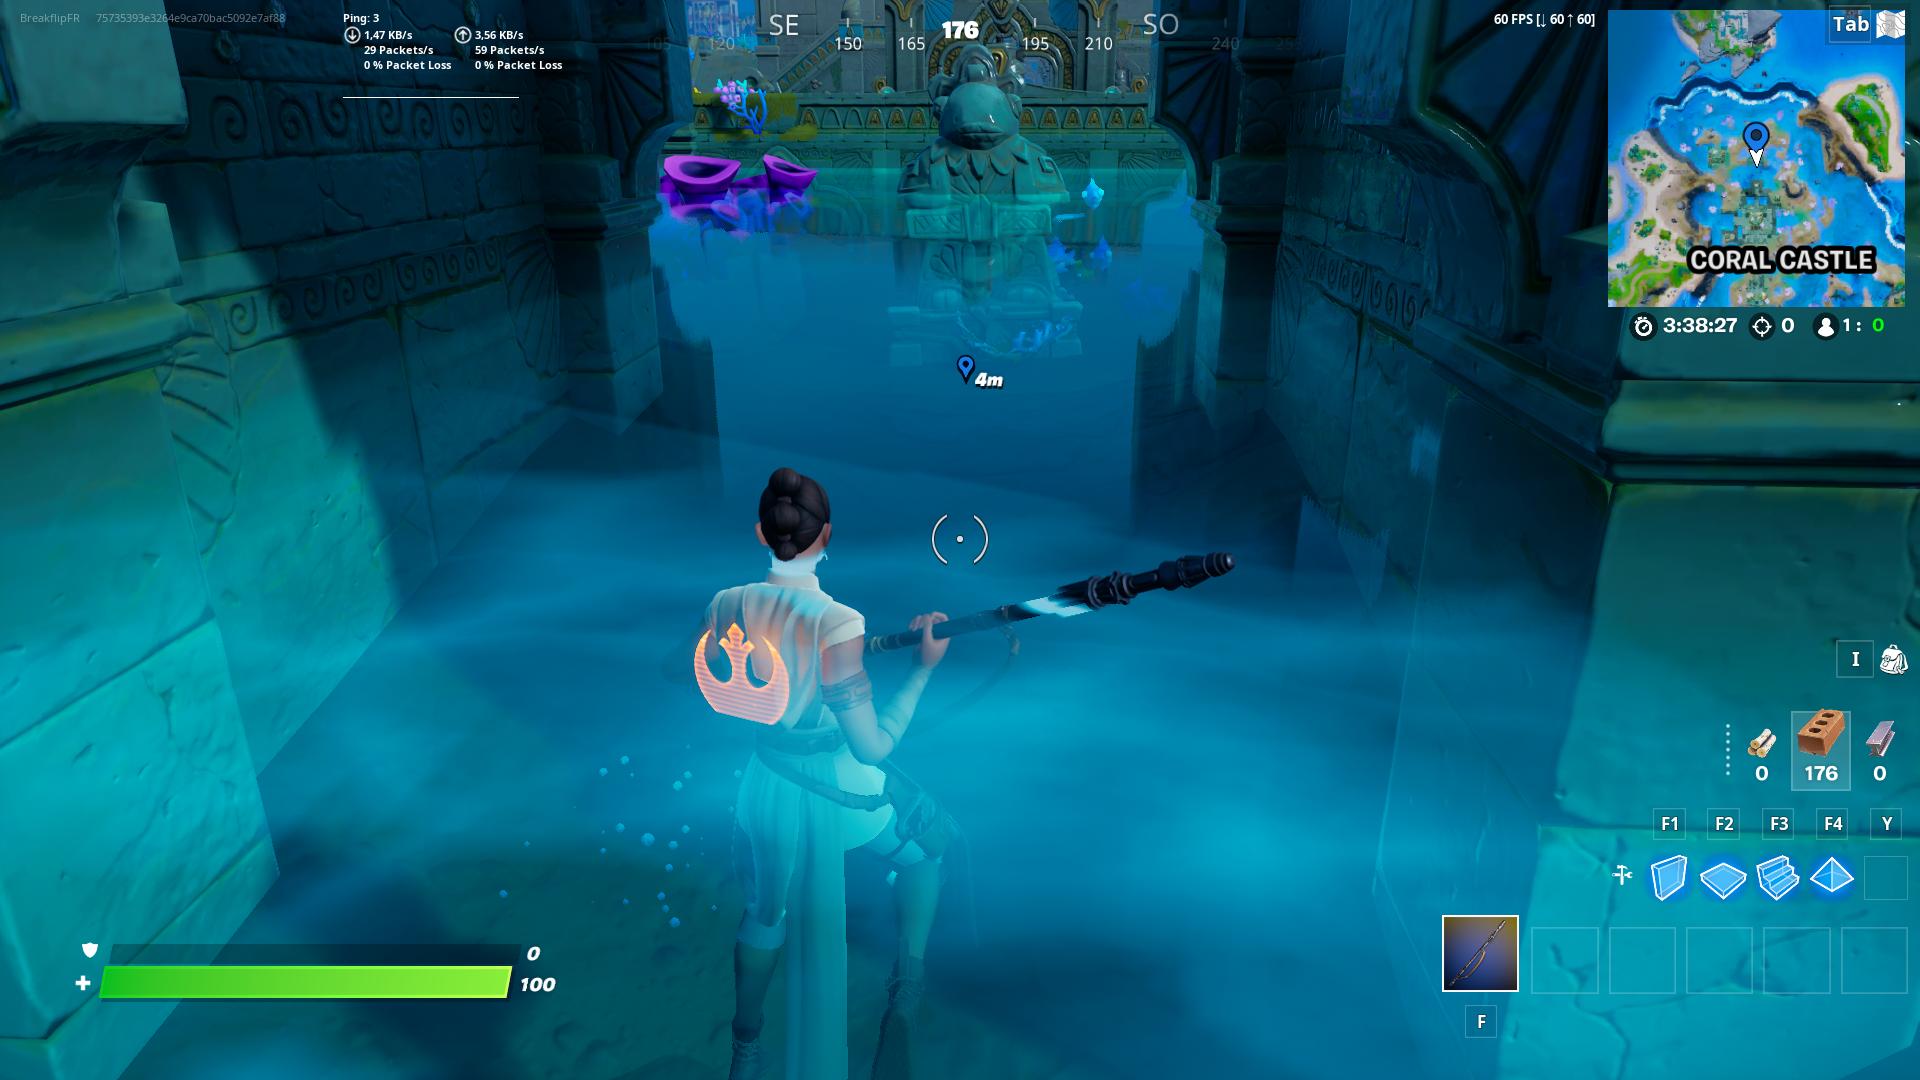 relique-coral-castle-stealthy-stronghold-defi-fortnite-3